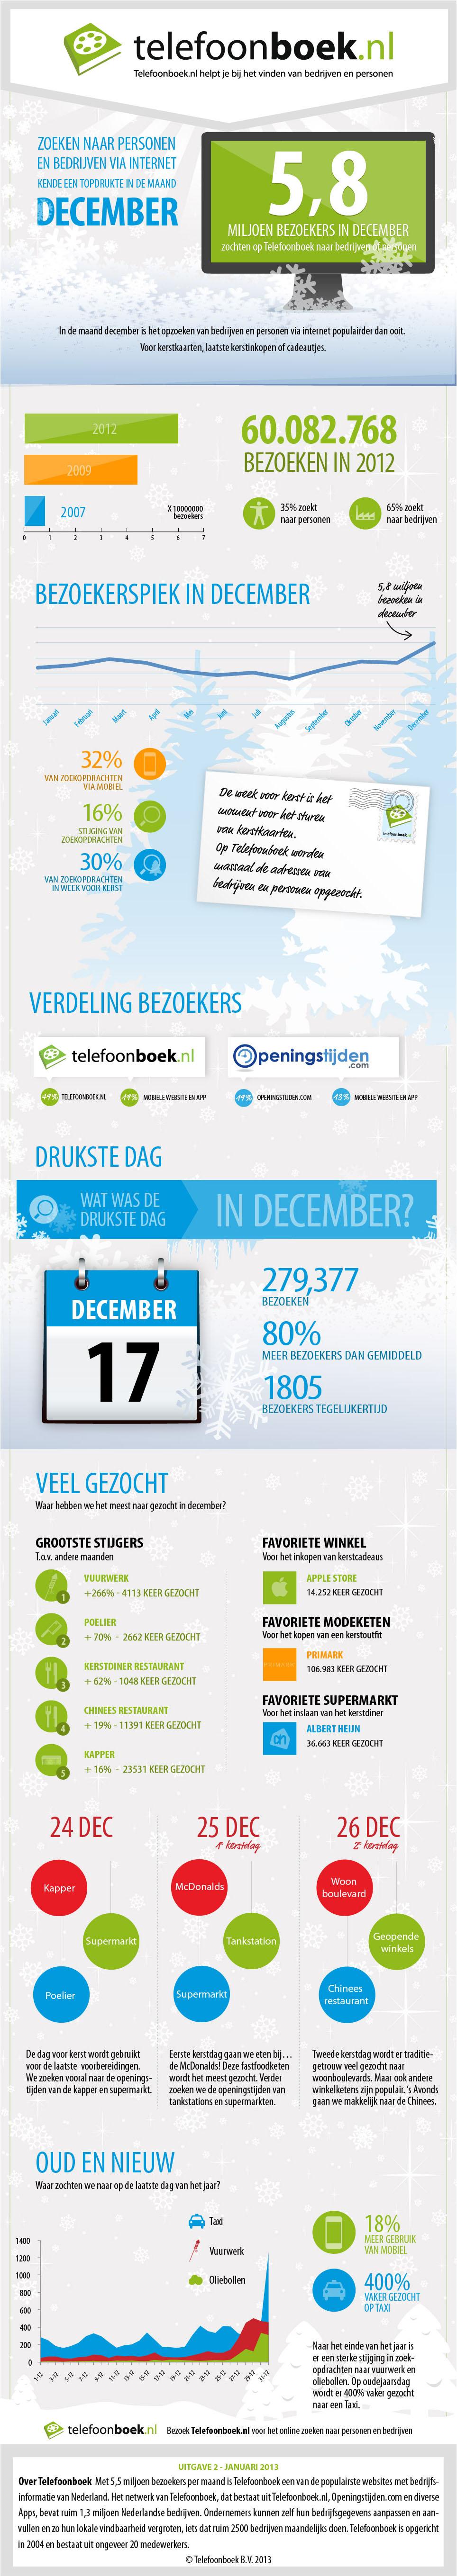 Infographic_Telefoonboek_2_cs5